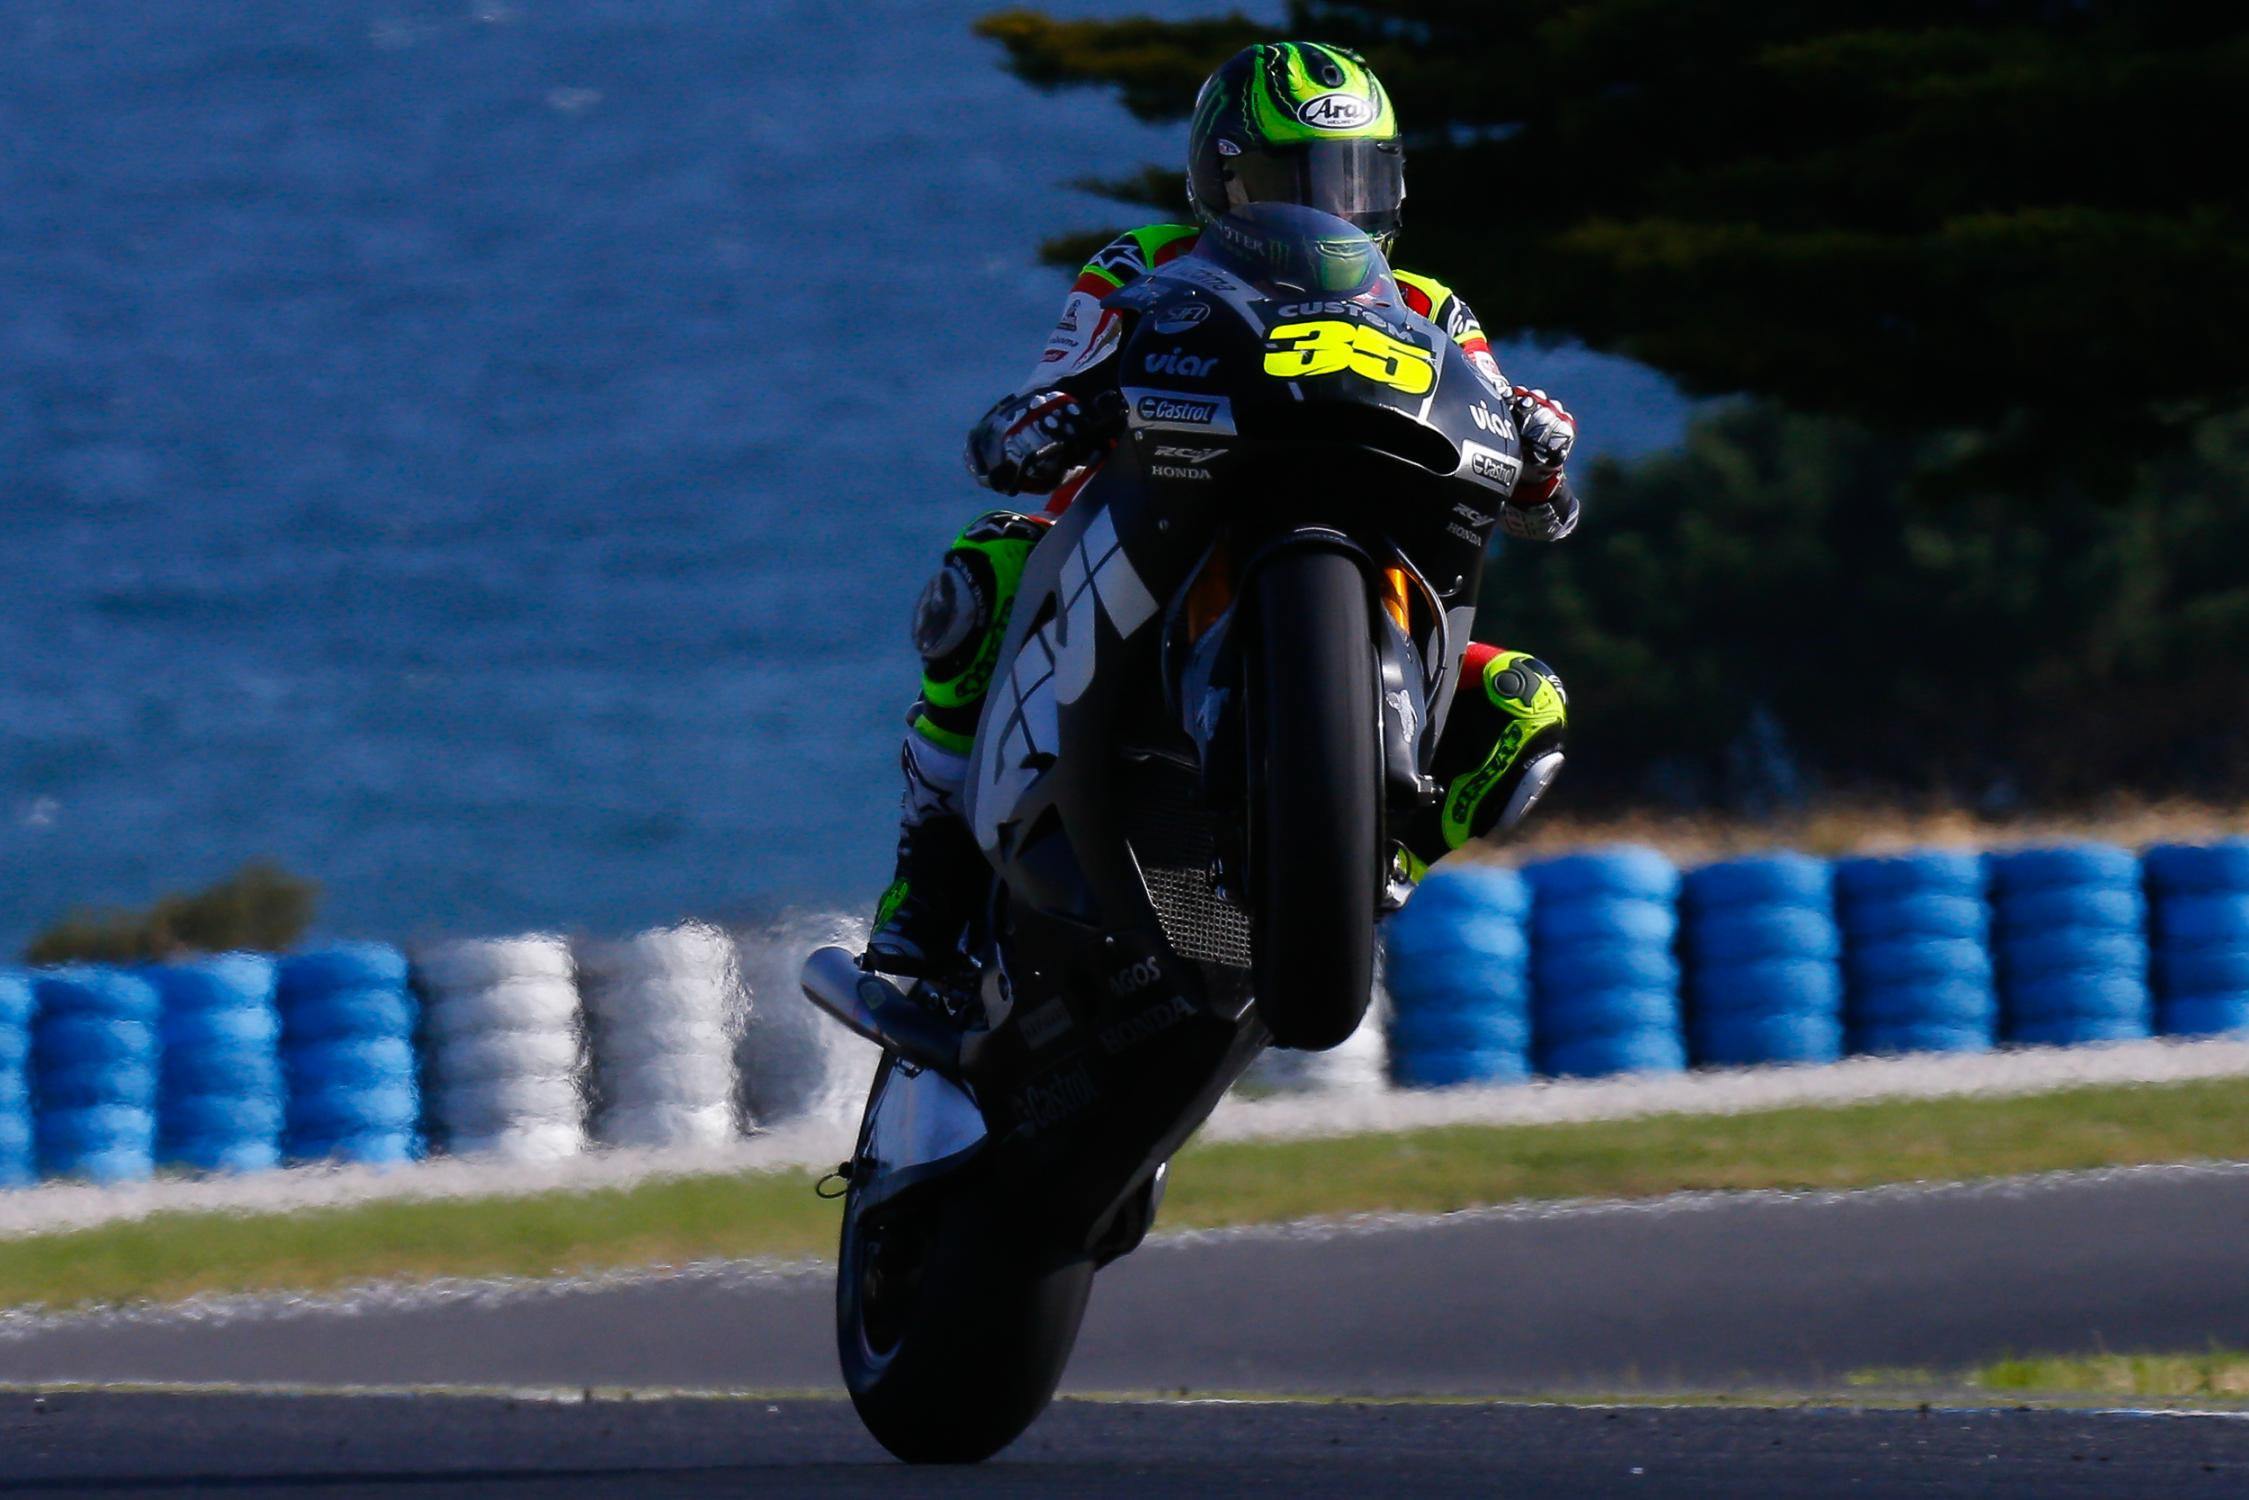 [MotoGP] Test Phillip Island 35-cal-crutchlow-eng-2017-action-australia-motogp-phillip-island-pre-season-test10584_test2017_action.gallery_full_top_fullscreen